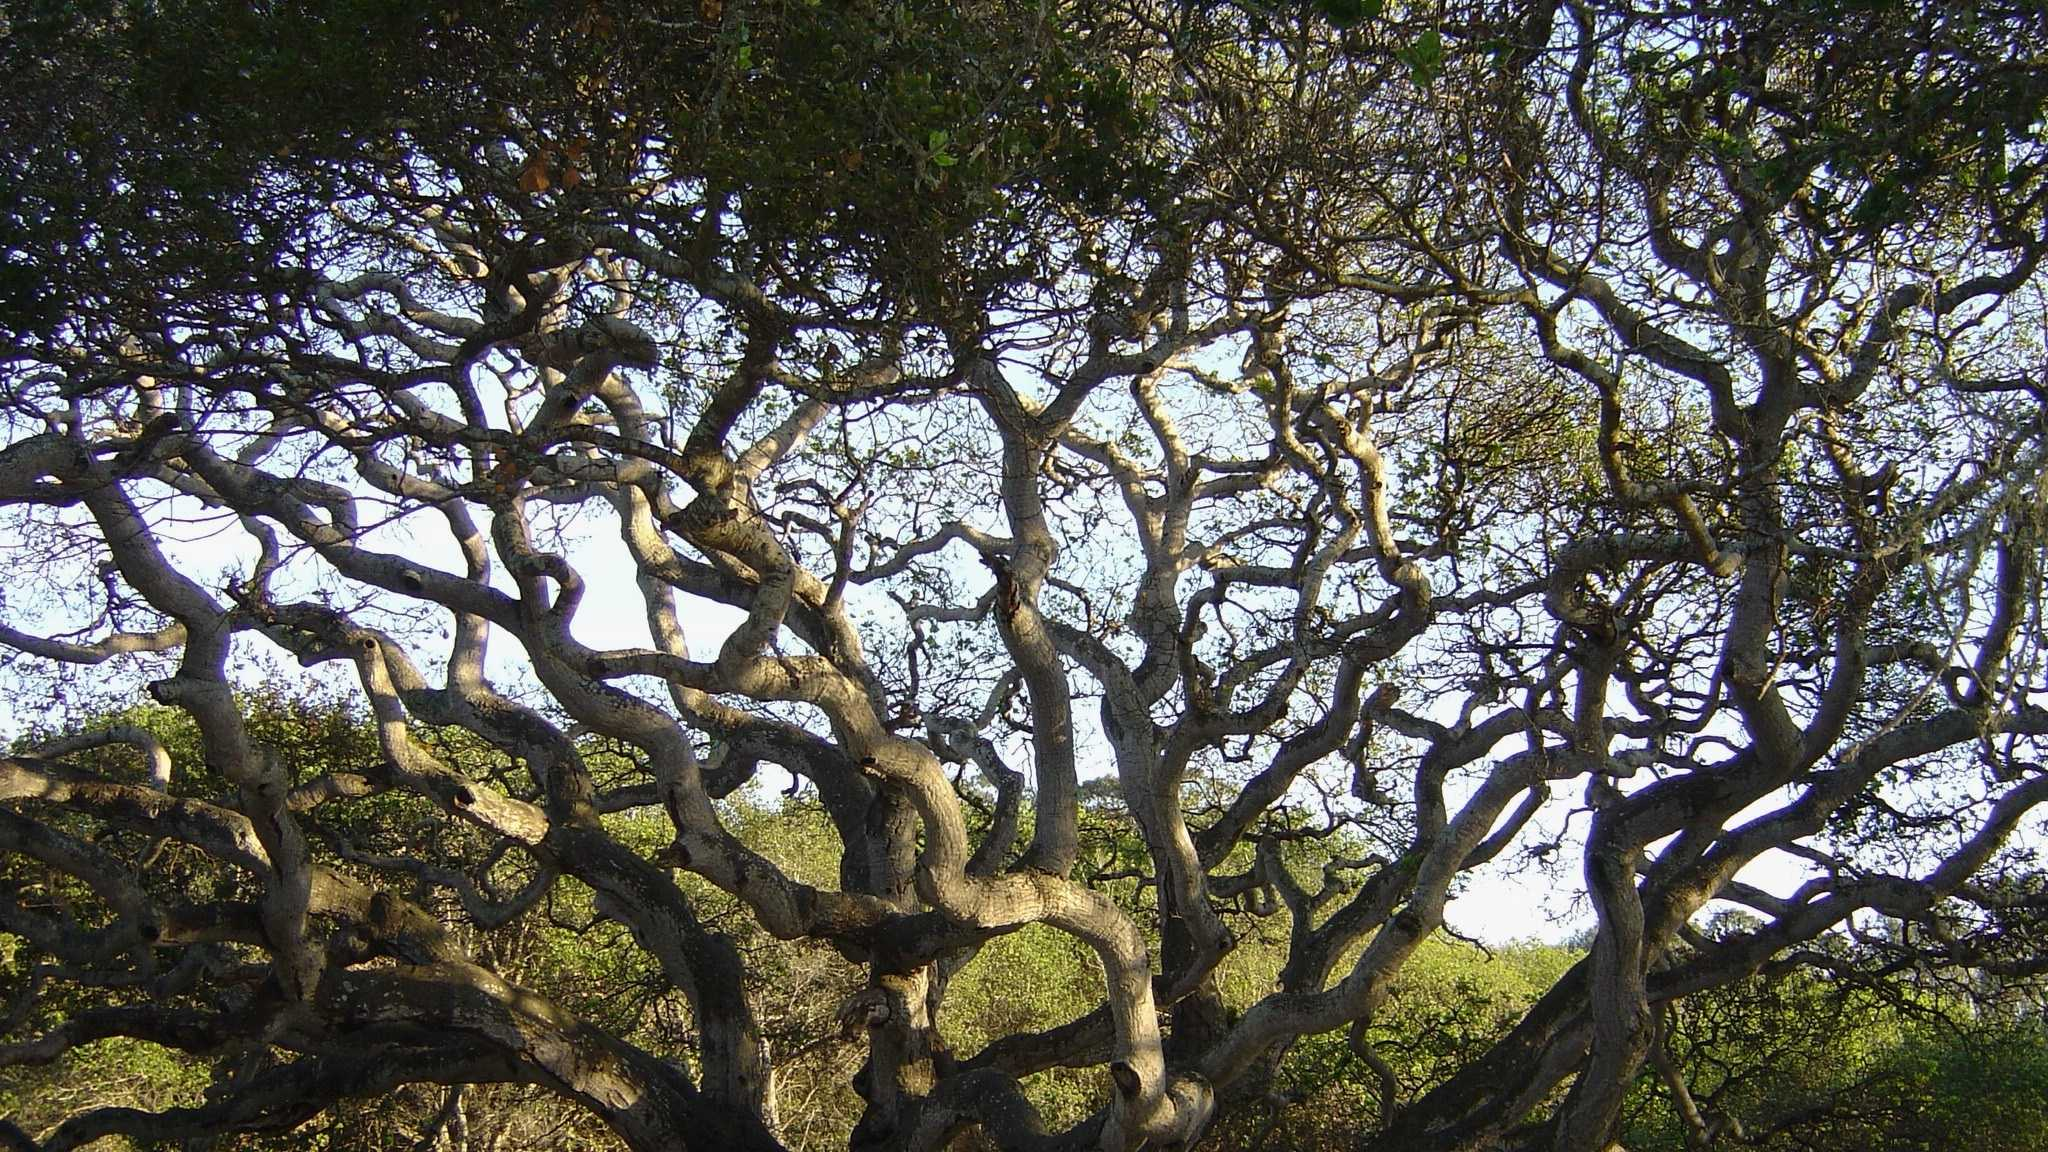 an essay on living on oak road Category: descriptive essays, descriptive, observation title: the haunted house.